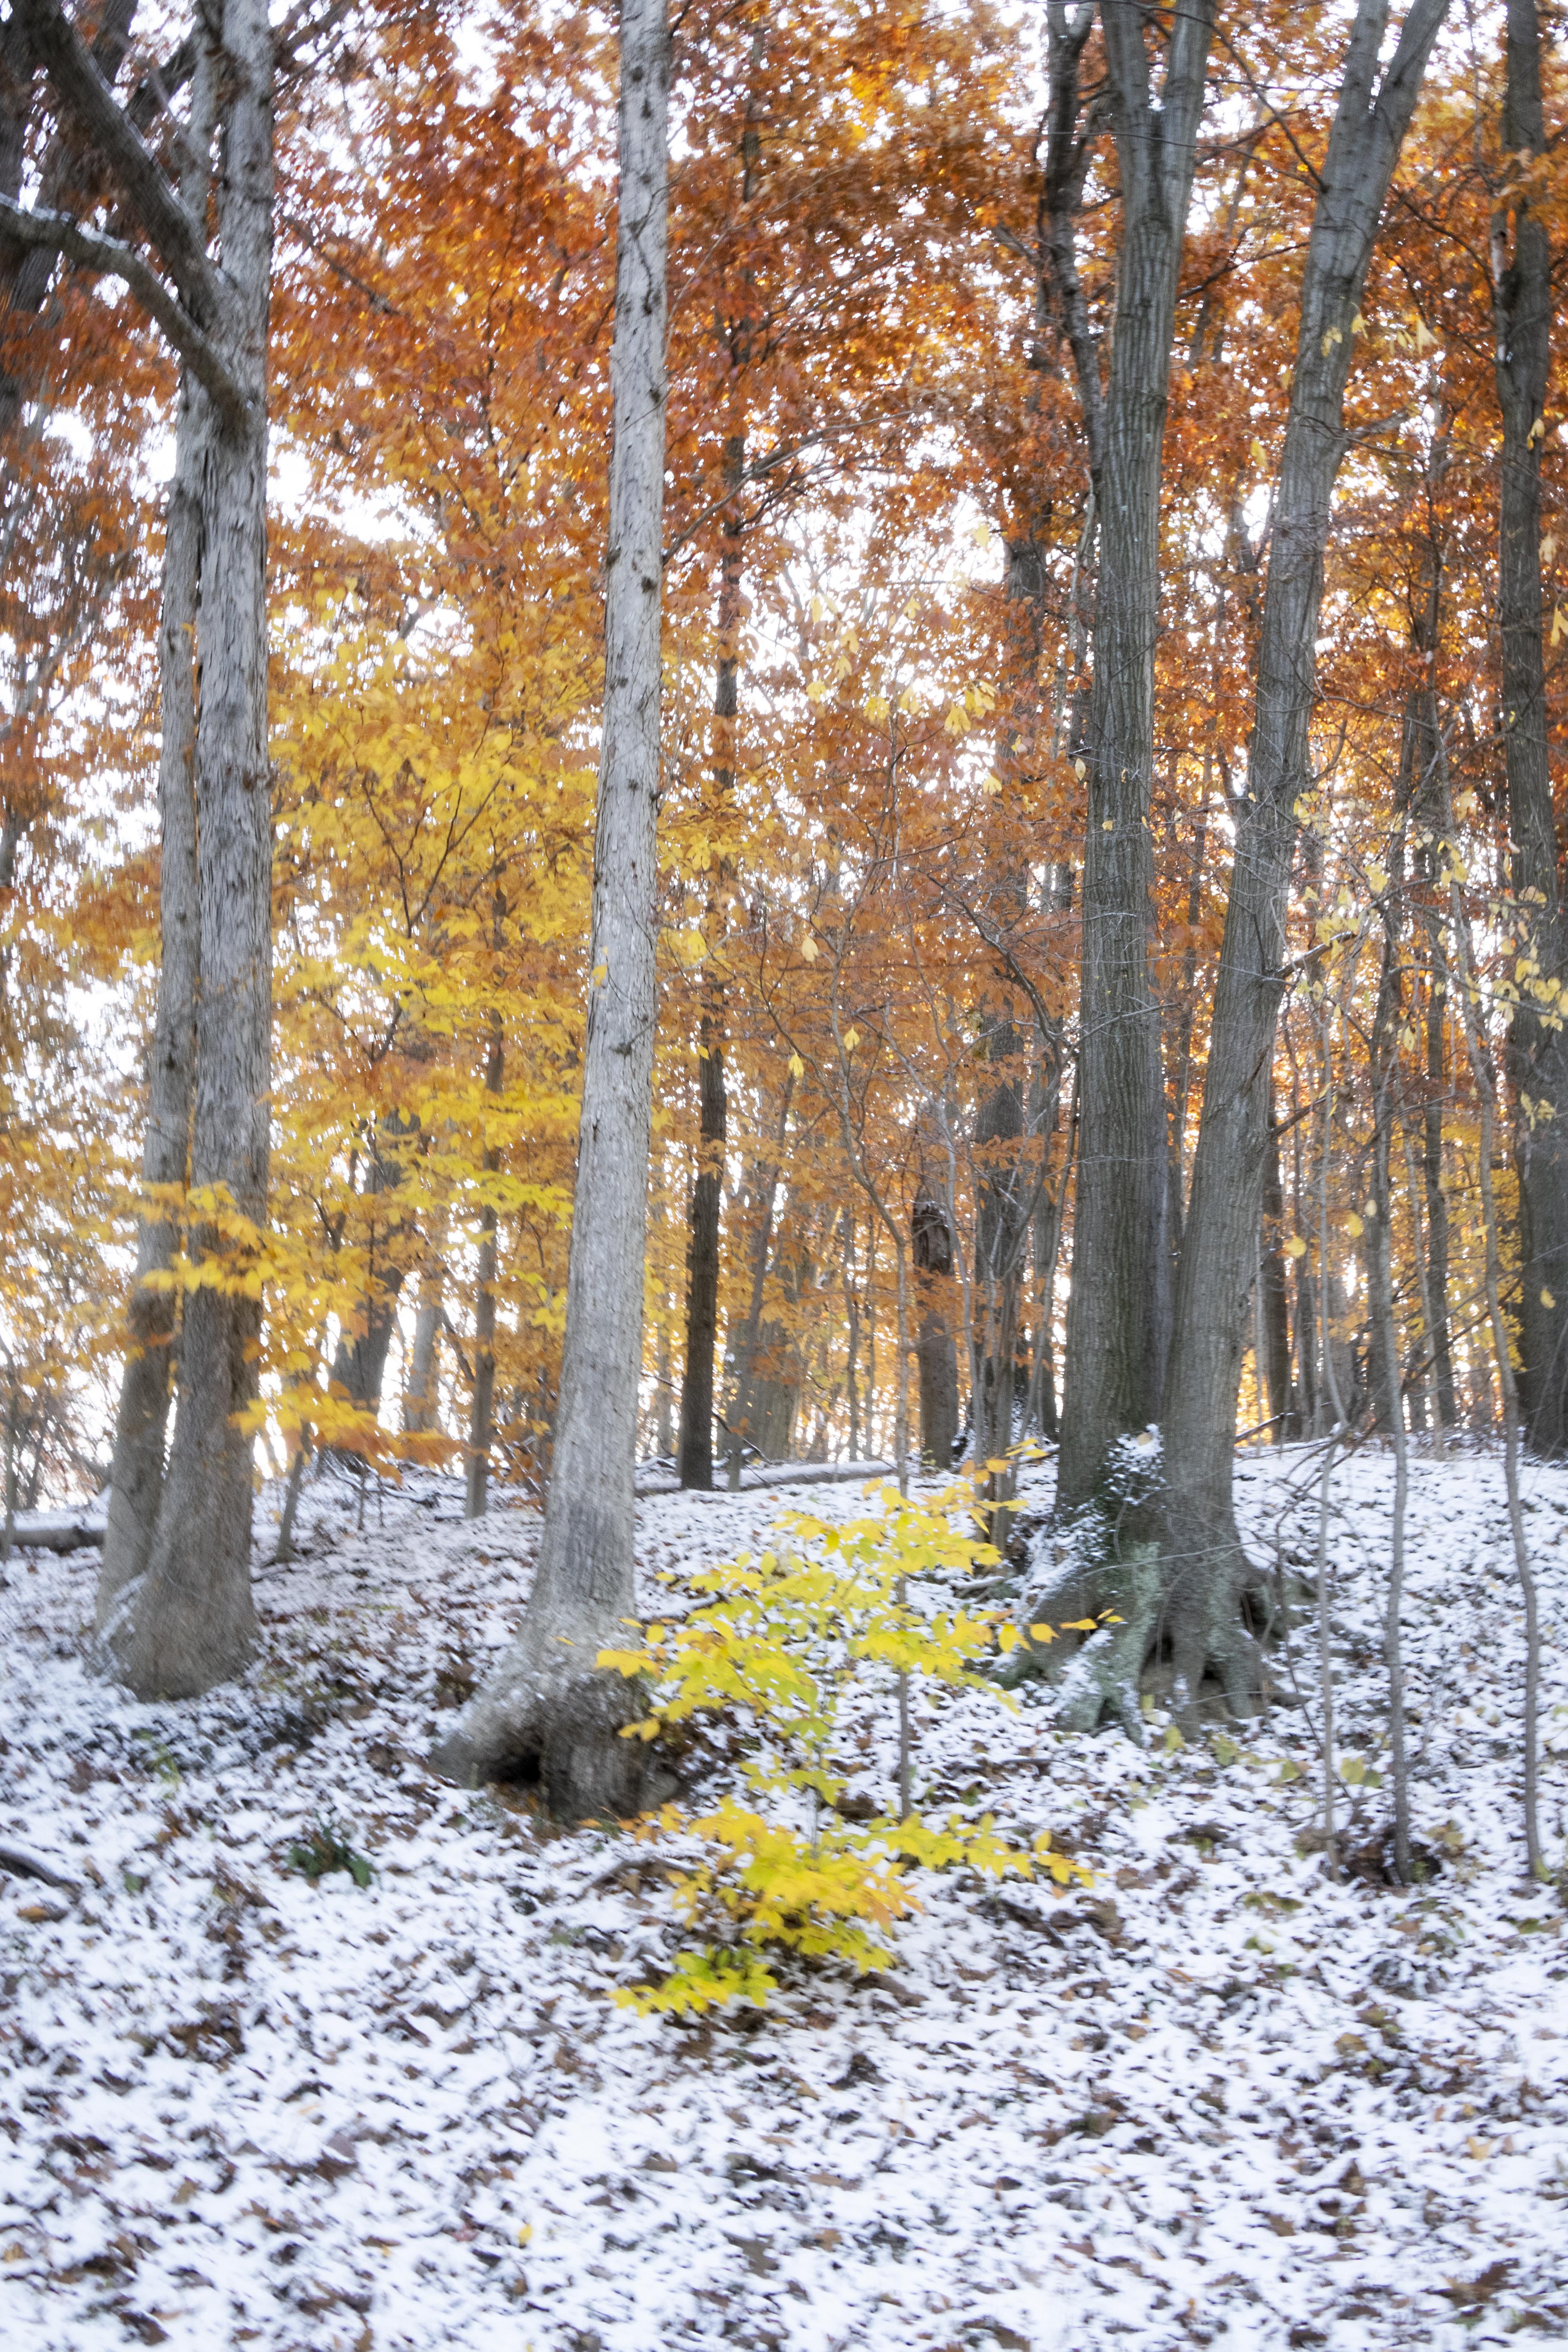 First Snow - In Autumn